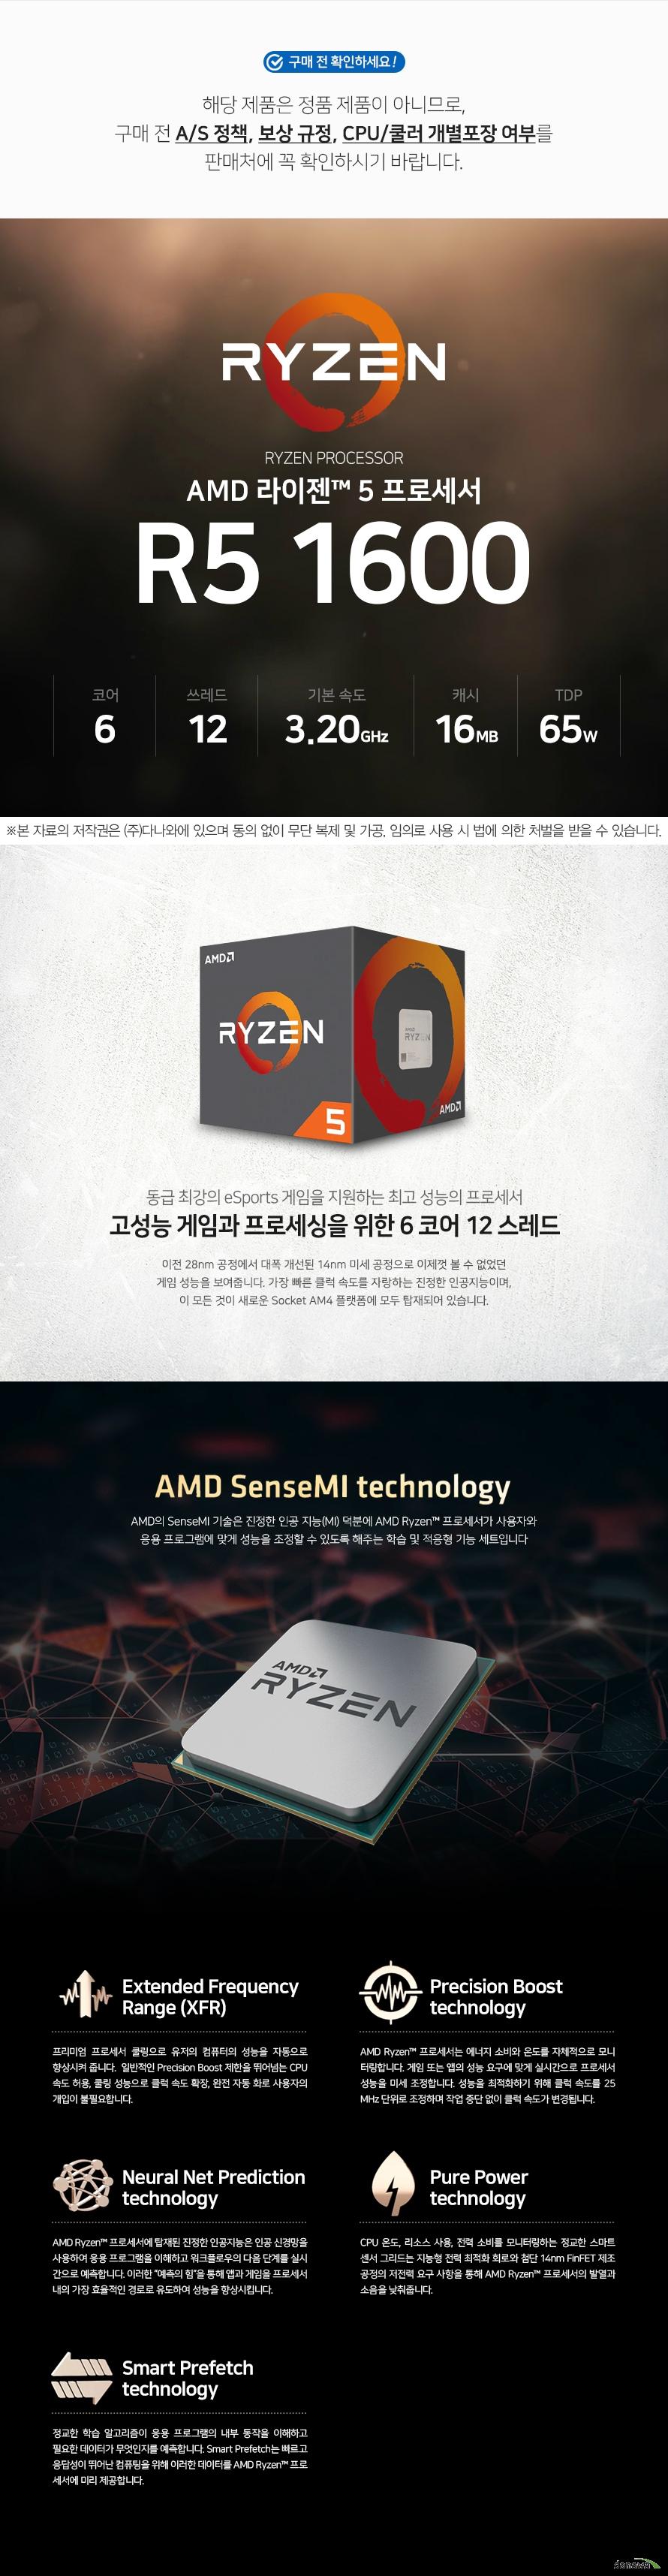 AMD 라이젠 5 1600 (서밋 릿지) (비정품)  해당 제품은 정품 제품이 아니므로,구매 전 A/S 정책, 보상 규정, CPU/쿨러 개별포장 여부를 판매처에 꼭 확인하시기 바랍니다.   대폭 개선된 14nm 미세공정 이전 28nm 공정에서 대폭 개선된 14nm 미세 공정으로 이제껏 볼 수 없었던 환상적인 성능을 보여줍니다. 가장 빠른 클럭 속도를 자랑하는 진정한 인공지능이며,  이 모든 것이 새로운 Socket AM4 플랫폼에 모두 탑재되어 있습니다.  Zen 코어 아키텍처 Zen 코어는 완전히 새롭게 바뀐